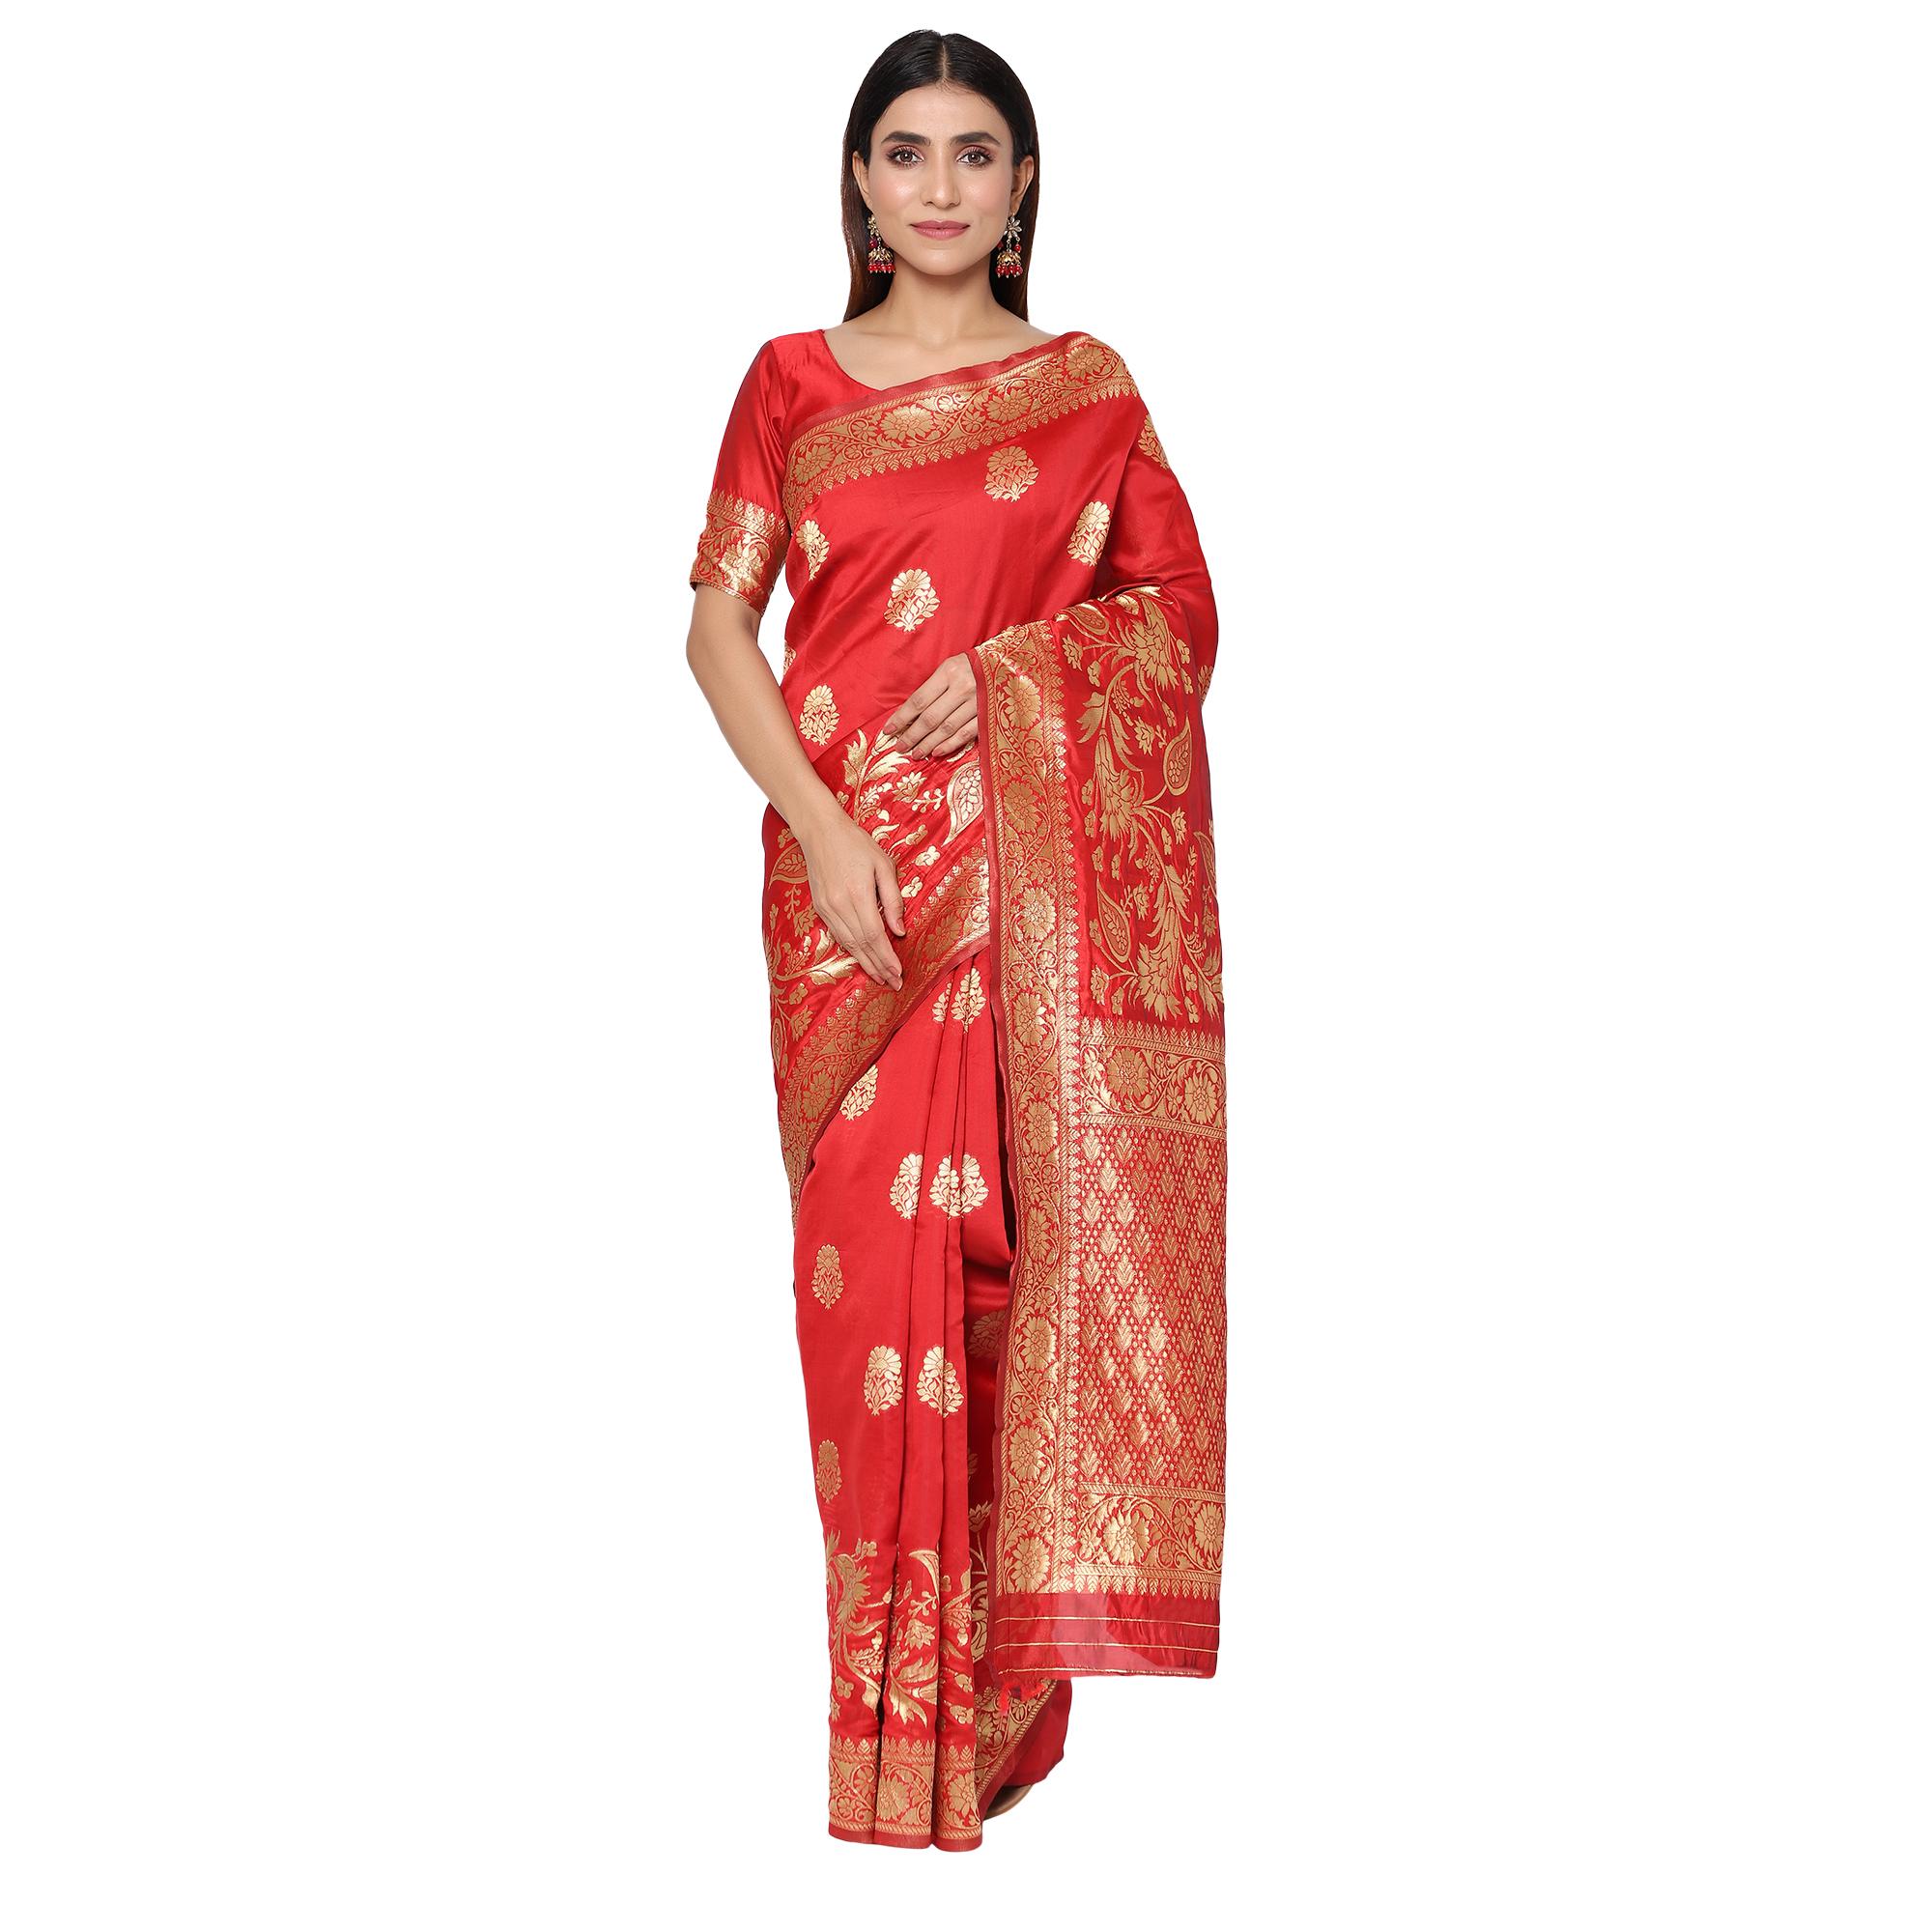 Glemora | Glemora Red Fancy Ethnic Wear Silk Blend Banarasi Traditional Saree